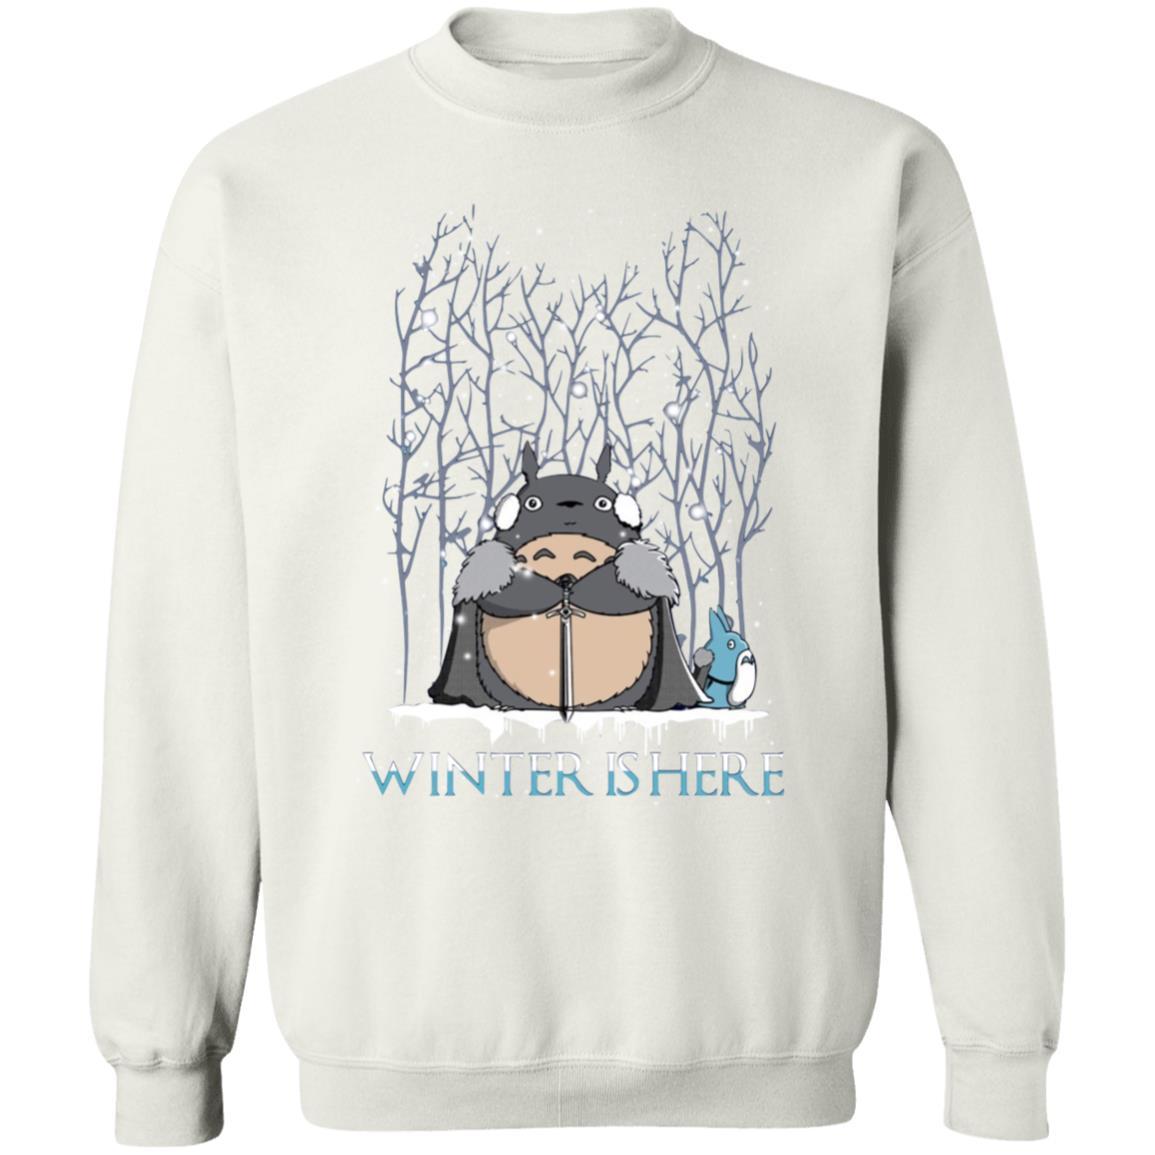 Totoro Game of Throne Winter is Here Sweatshirt